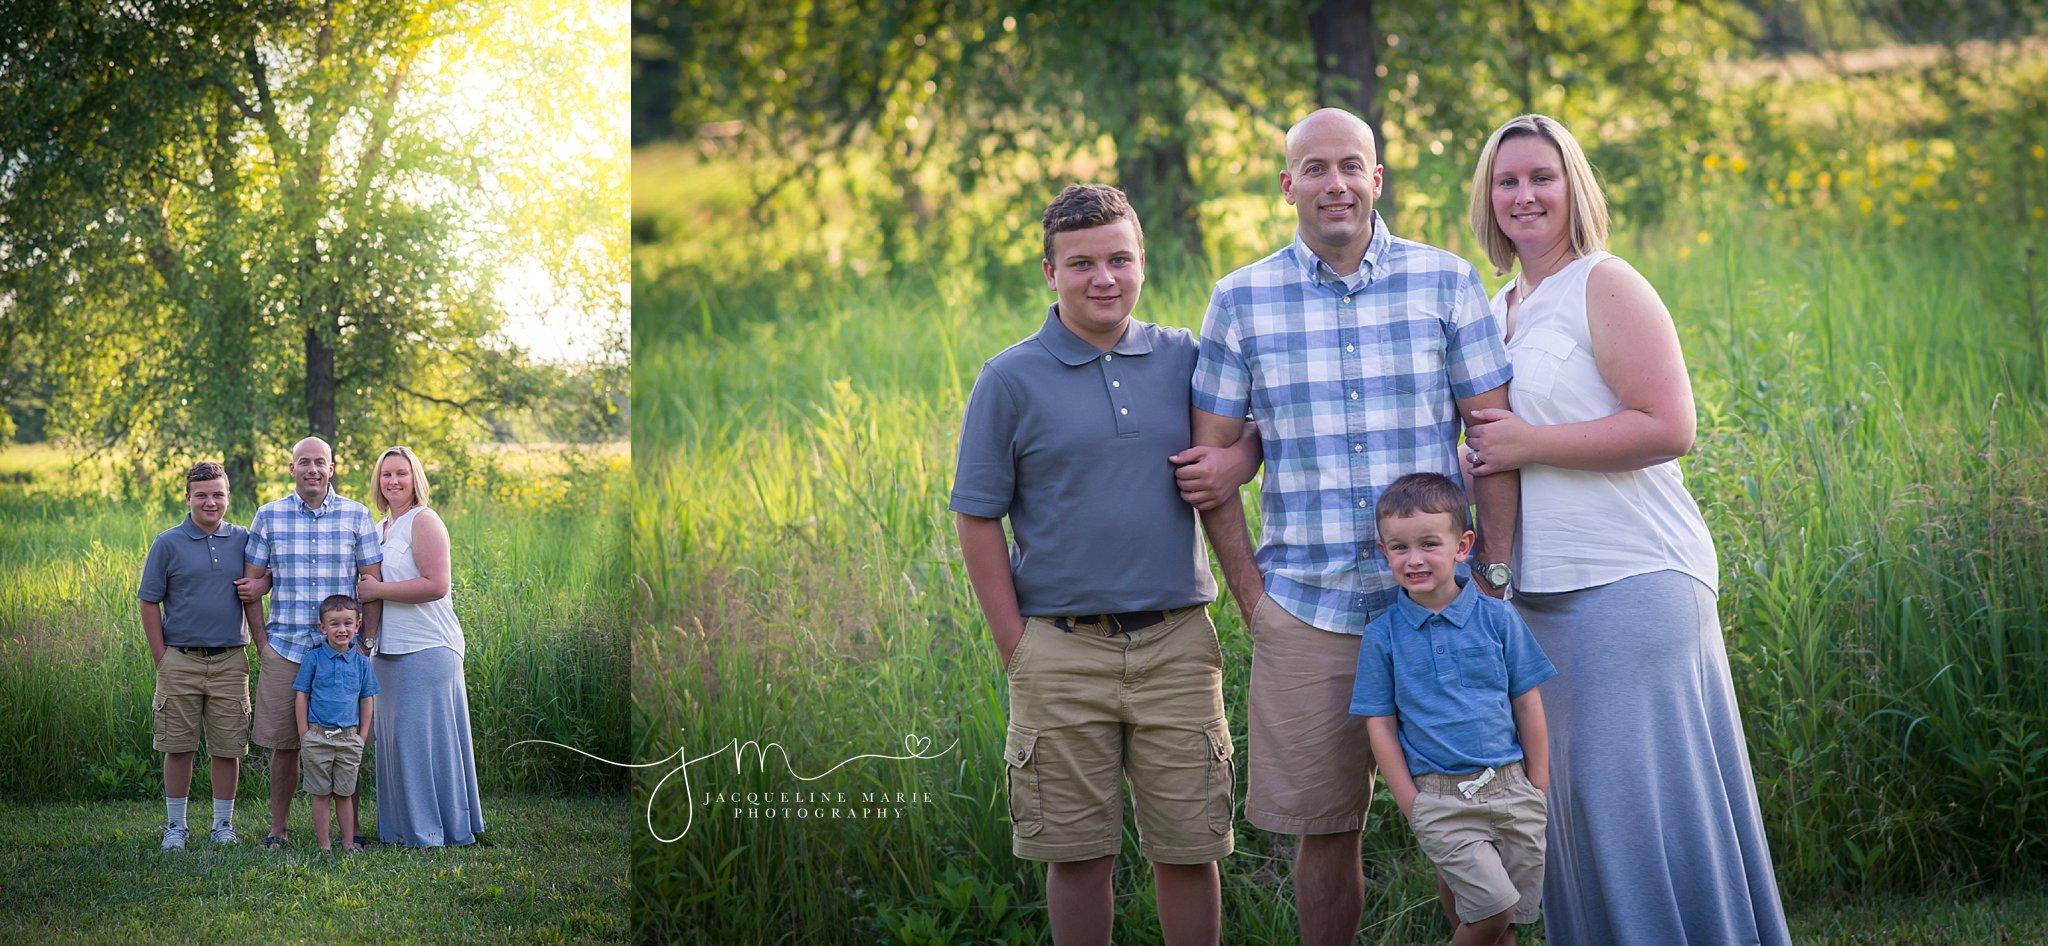 Columbus Ohio family photograpy, Columbus family photographer, family portraits Columbus, sunset family session, family of four pose, Jacqueline Marie Photography LLC